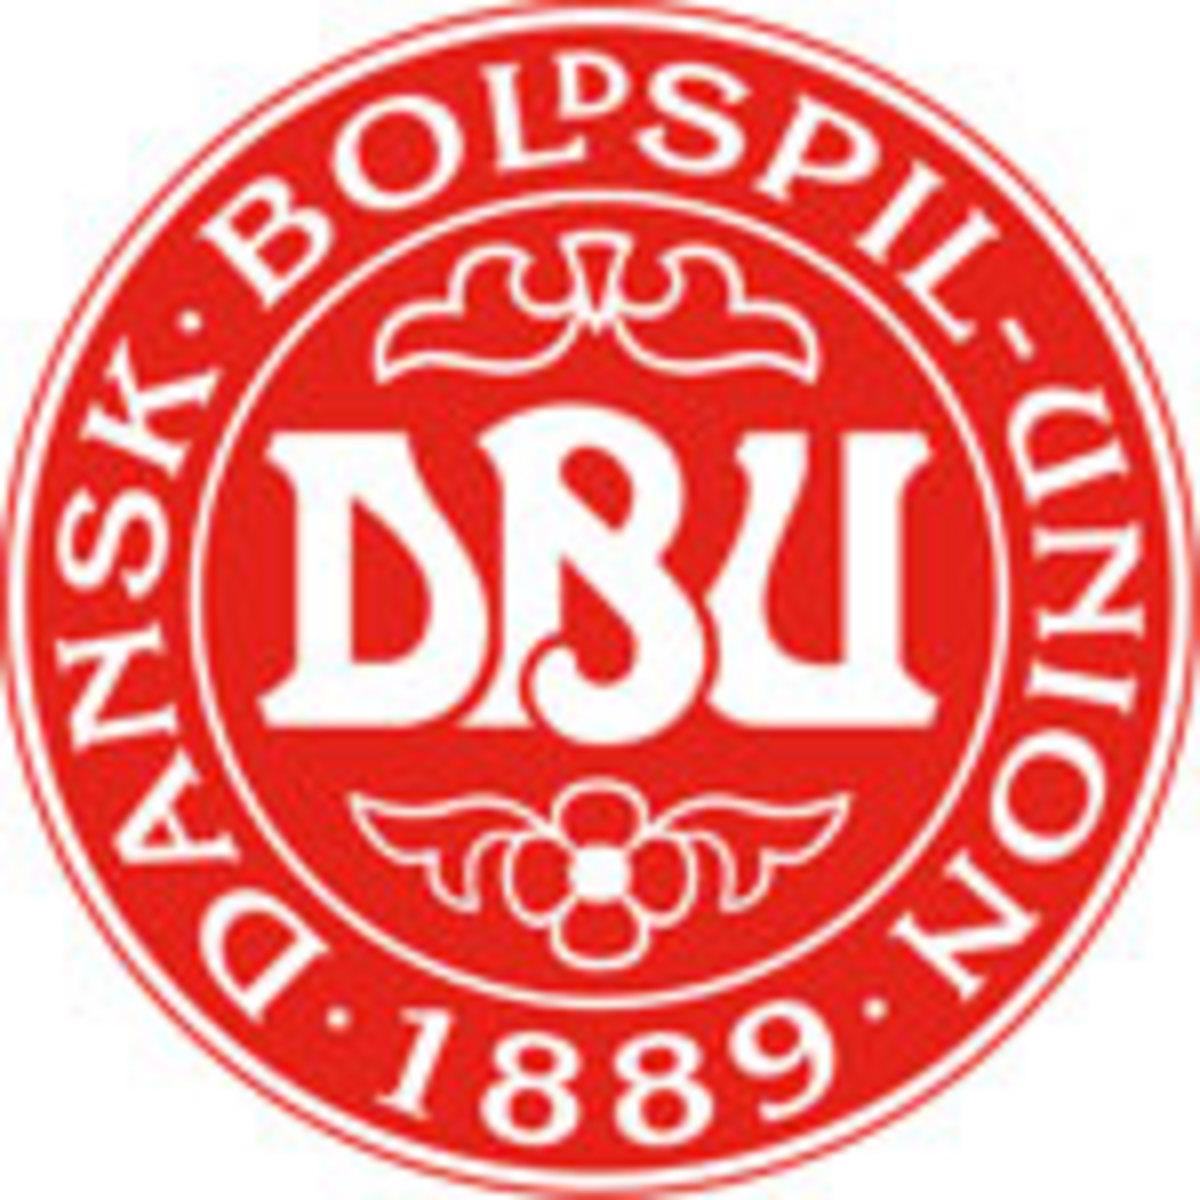 denmark-world-cup-logo.jpg